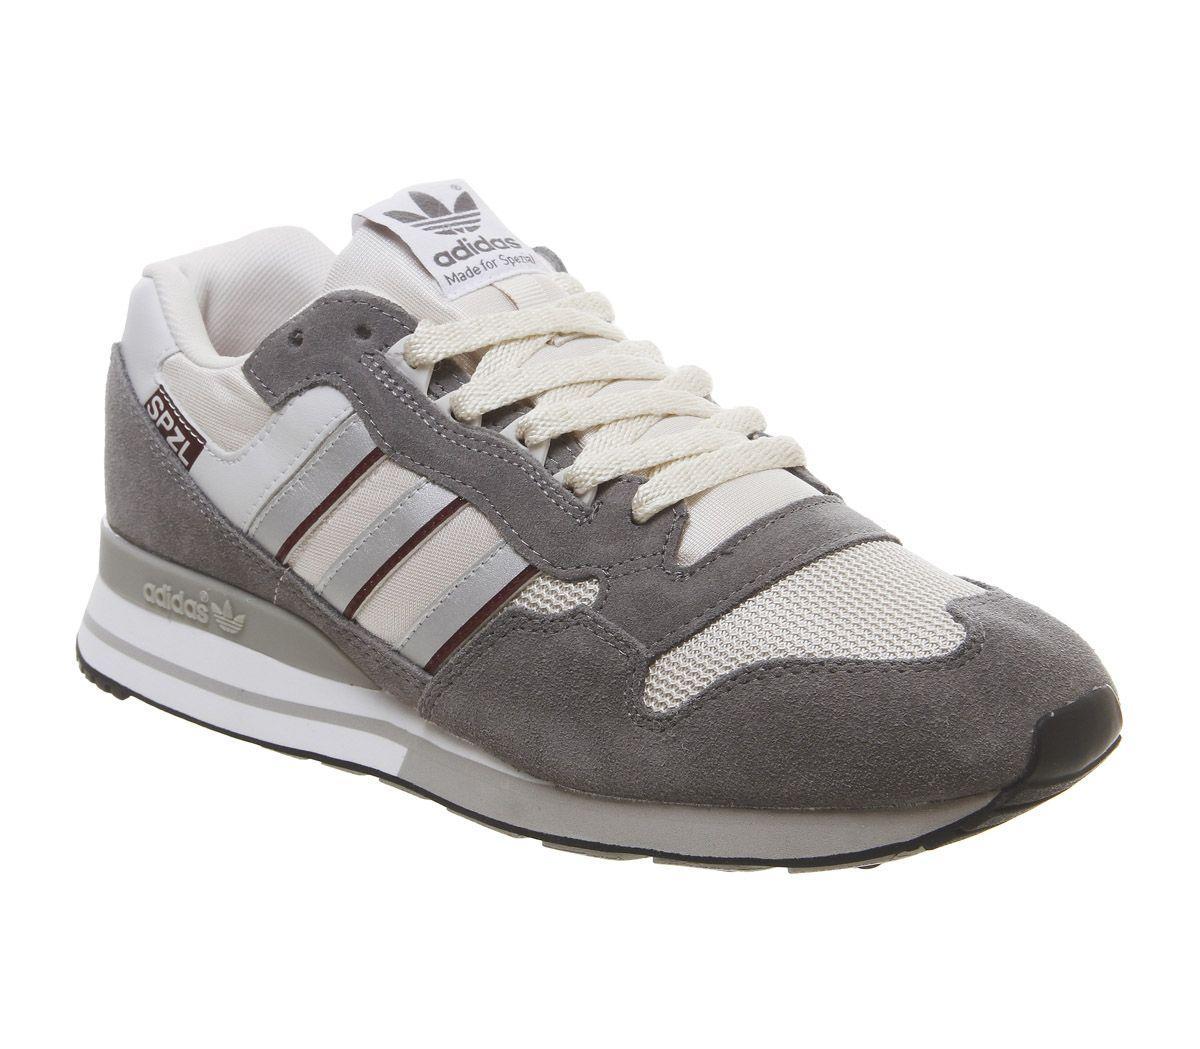 031f47df6c040 adidas Originals Zx530 Spzl Trainers in Gray for Men - Lyst